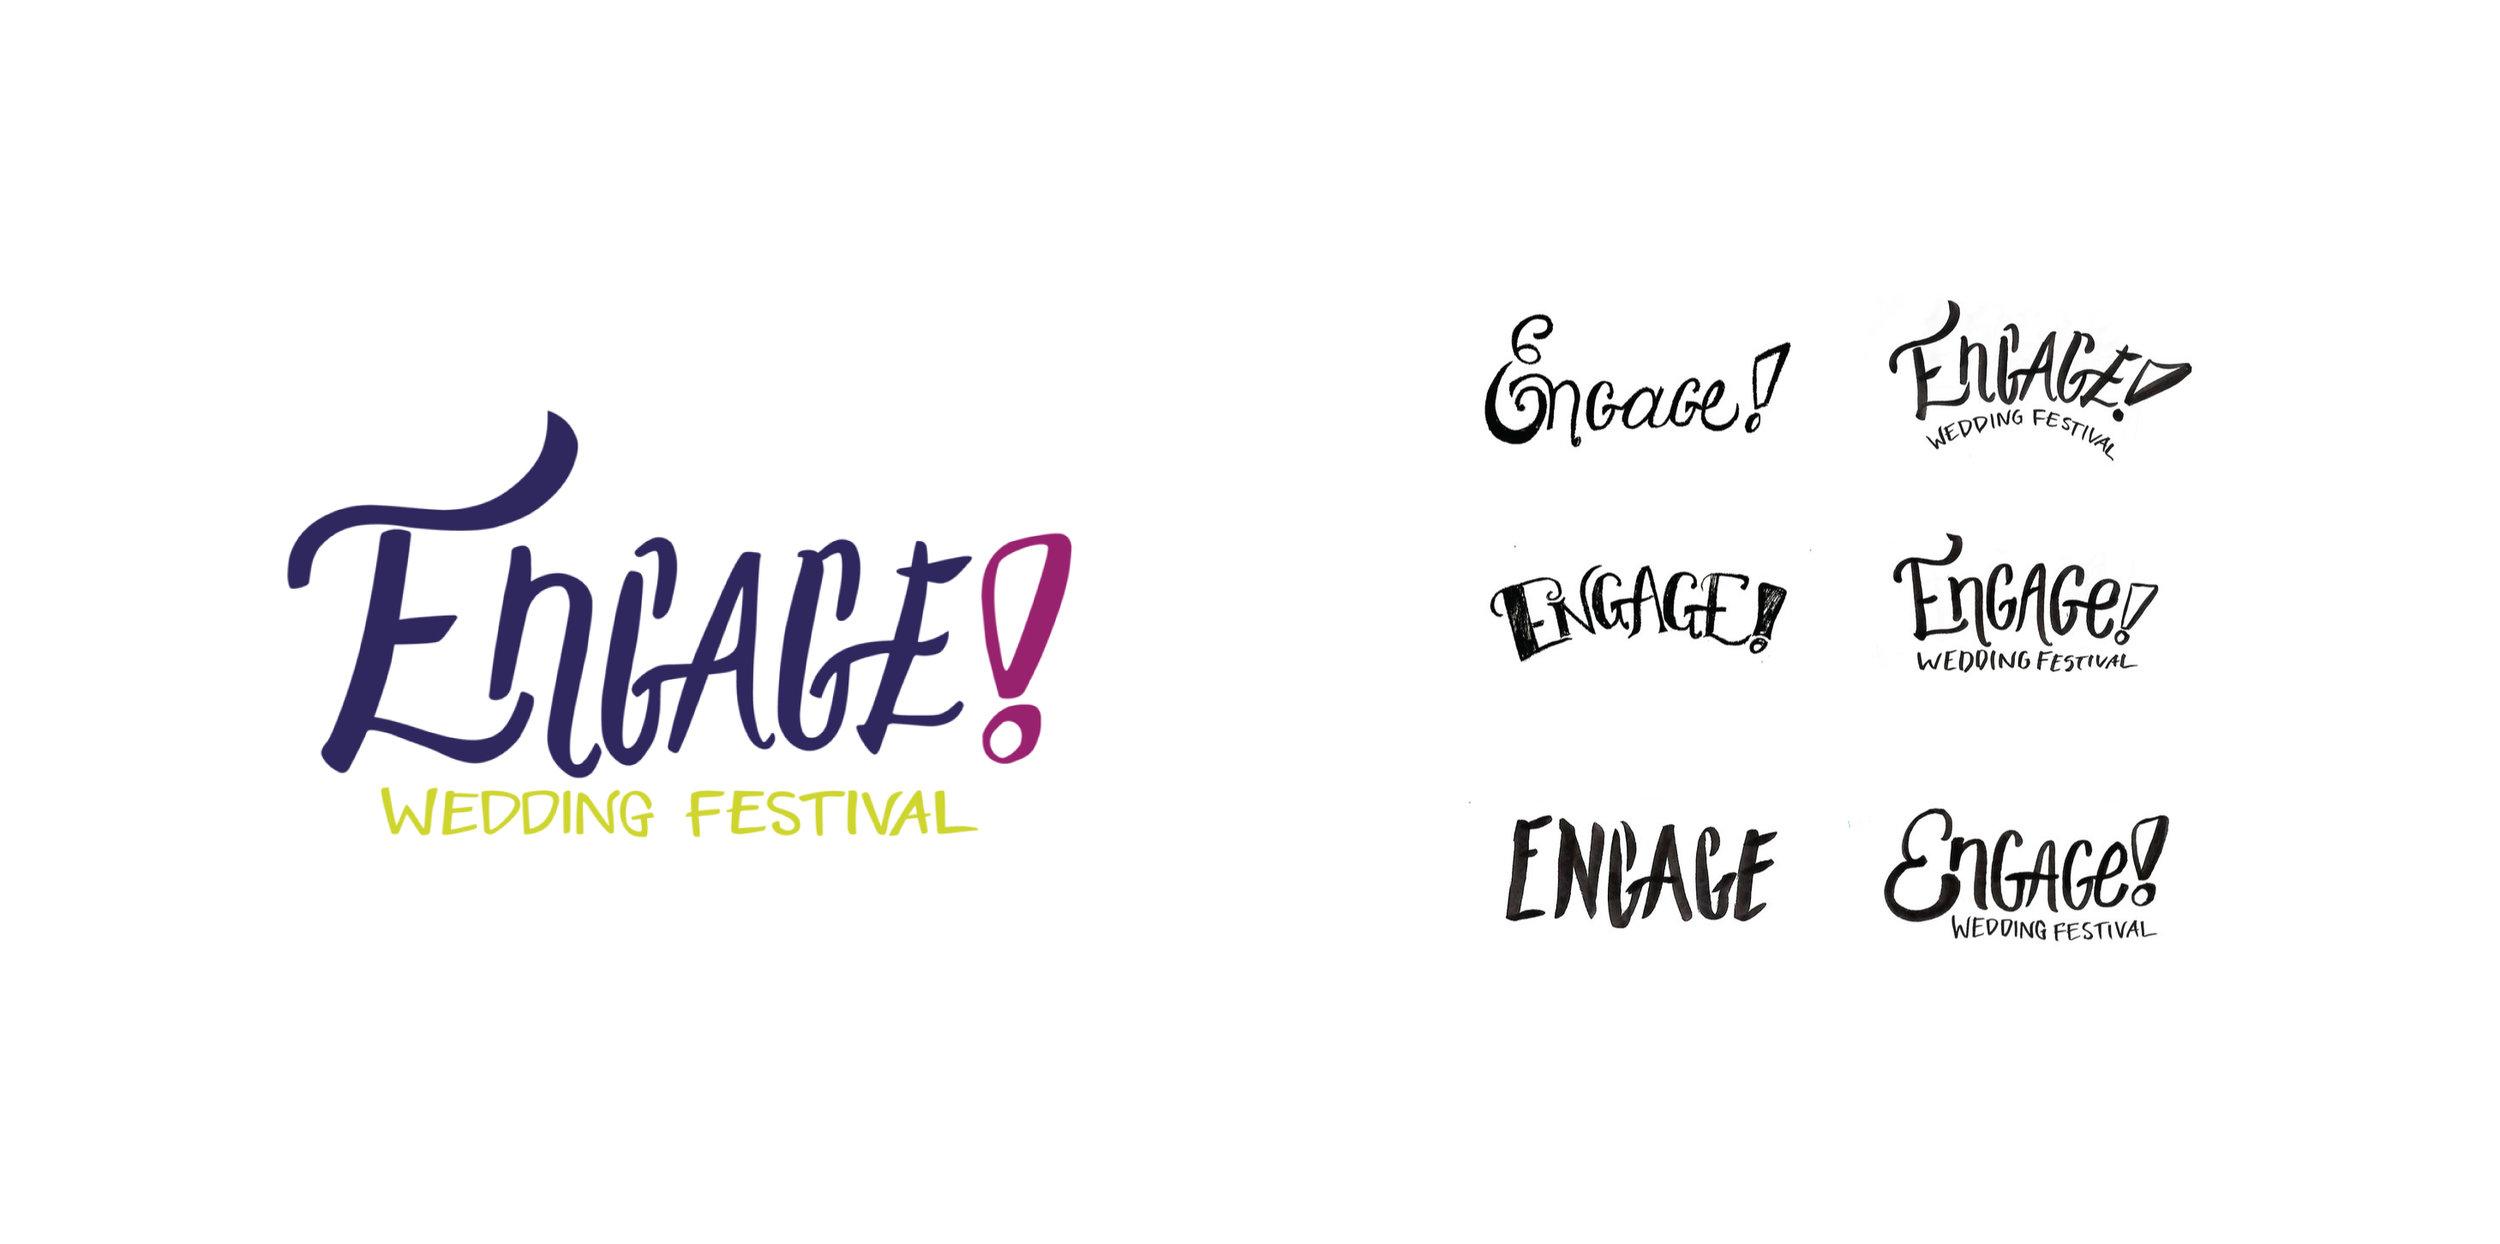 Engage Wedding Festival